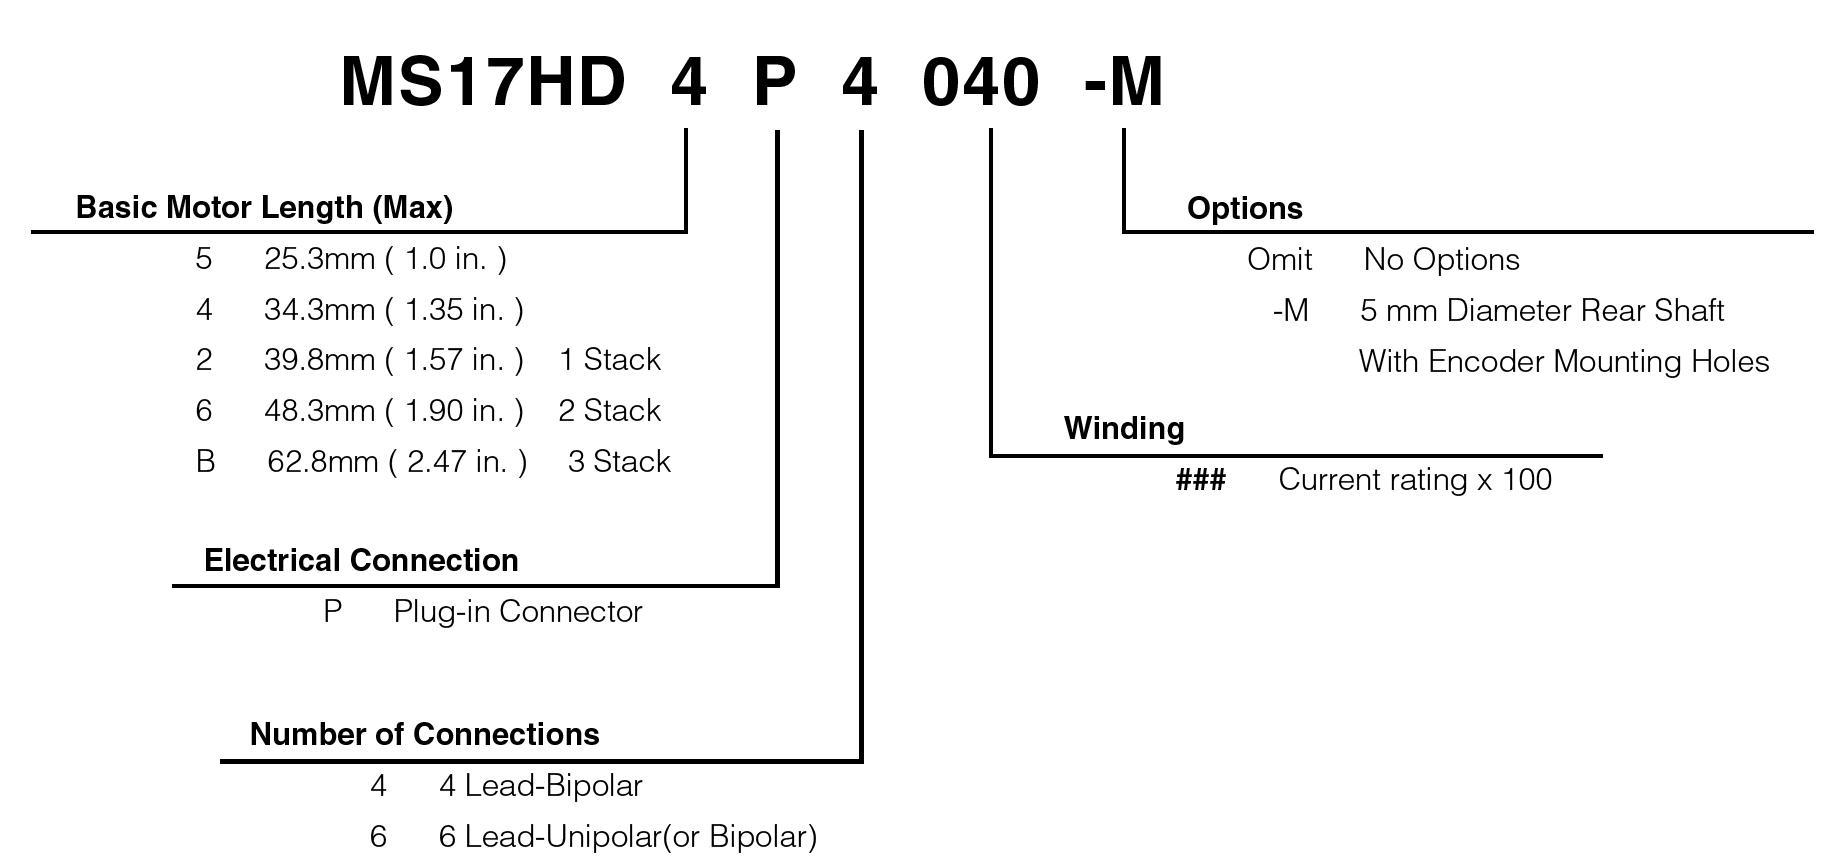 Model Numbering System of NEMA 17 Standard Hybrid Stepper Motors